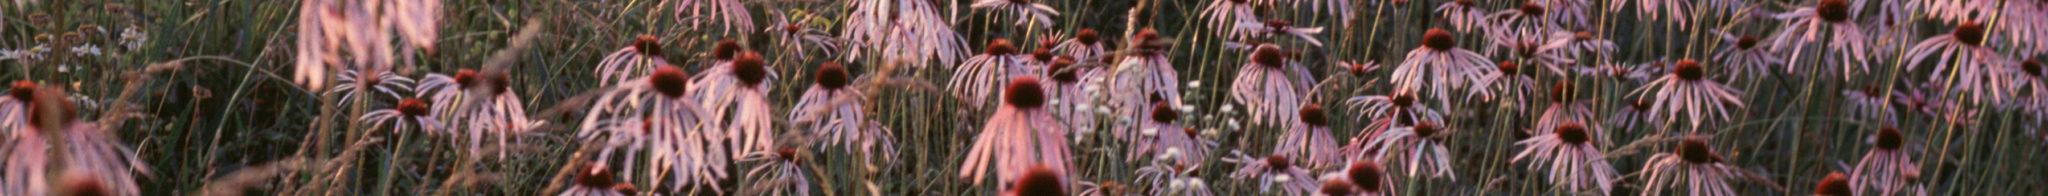 Testimonials - image echinacea-strip-for-newsletter-copy on https://angelaferri.com